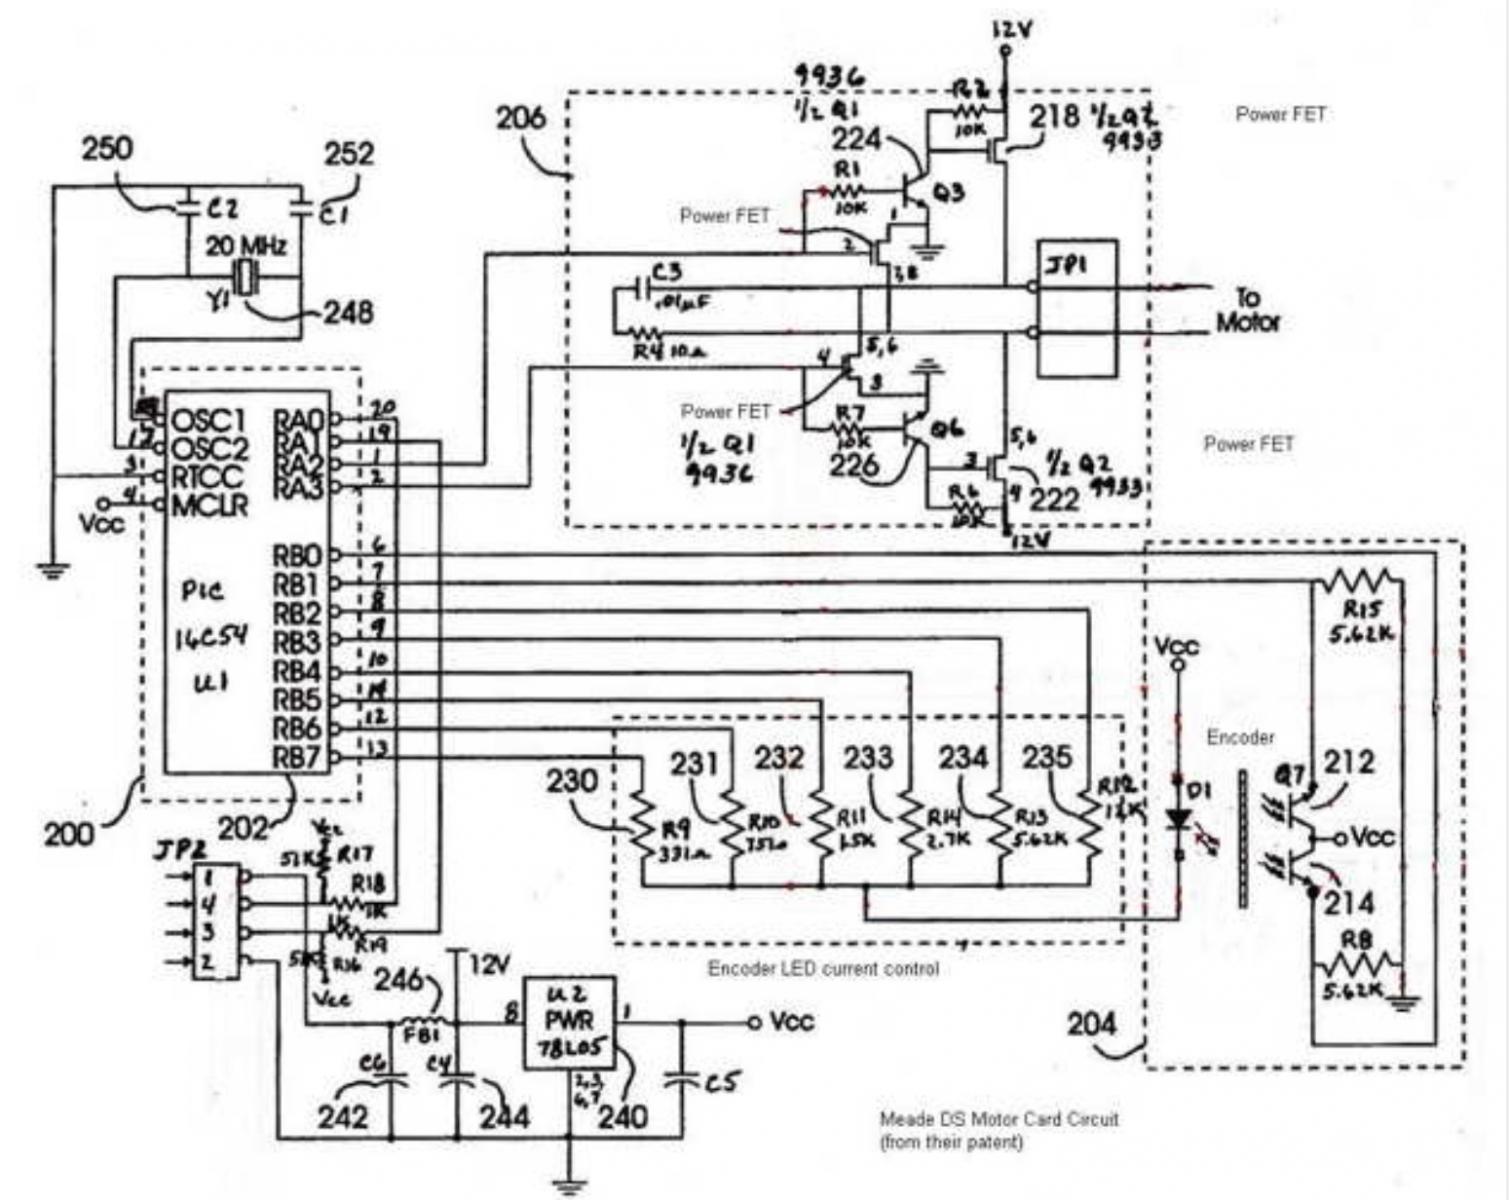 Lx 80 Multimount Technical Repair Information